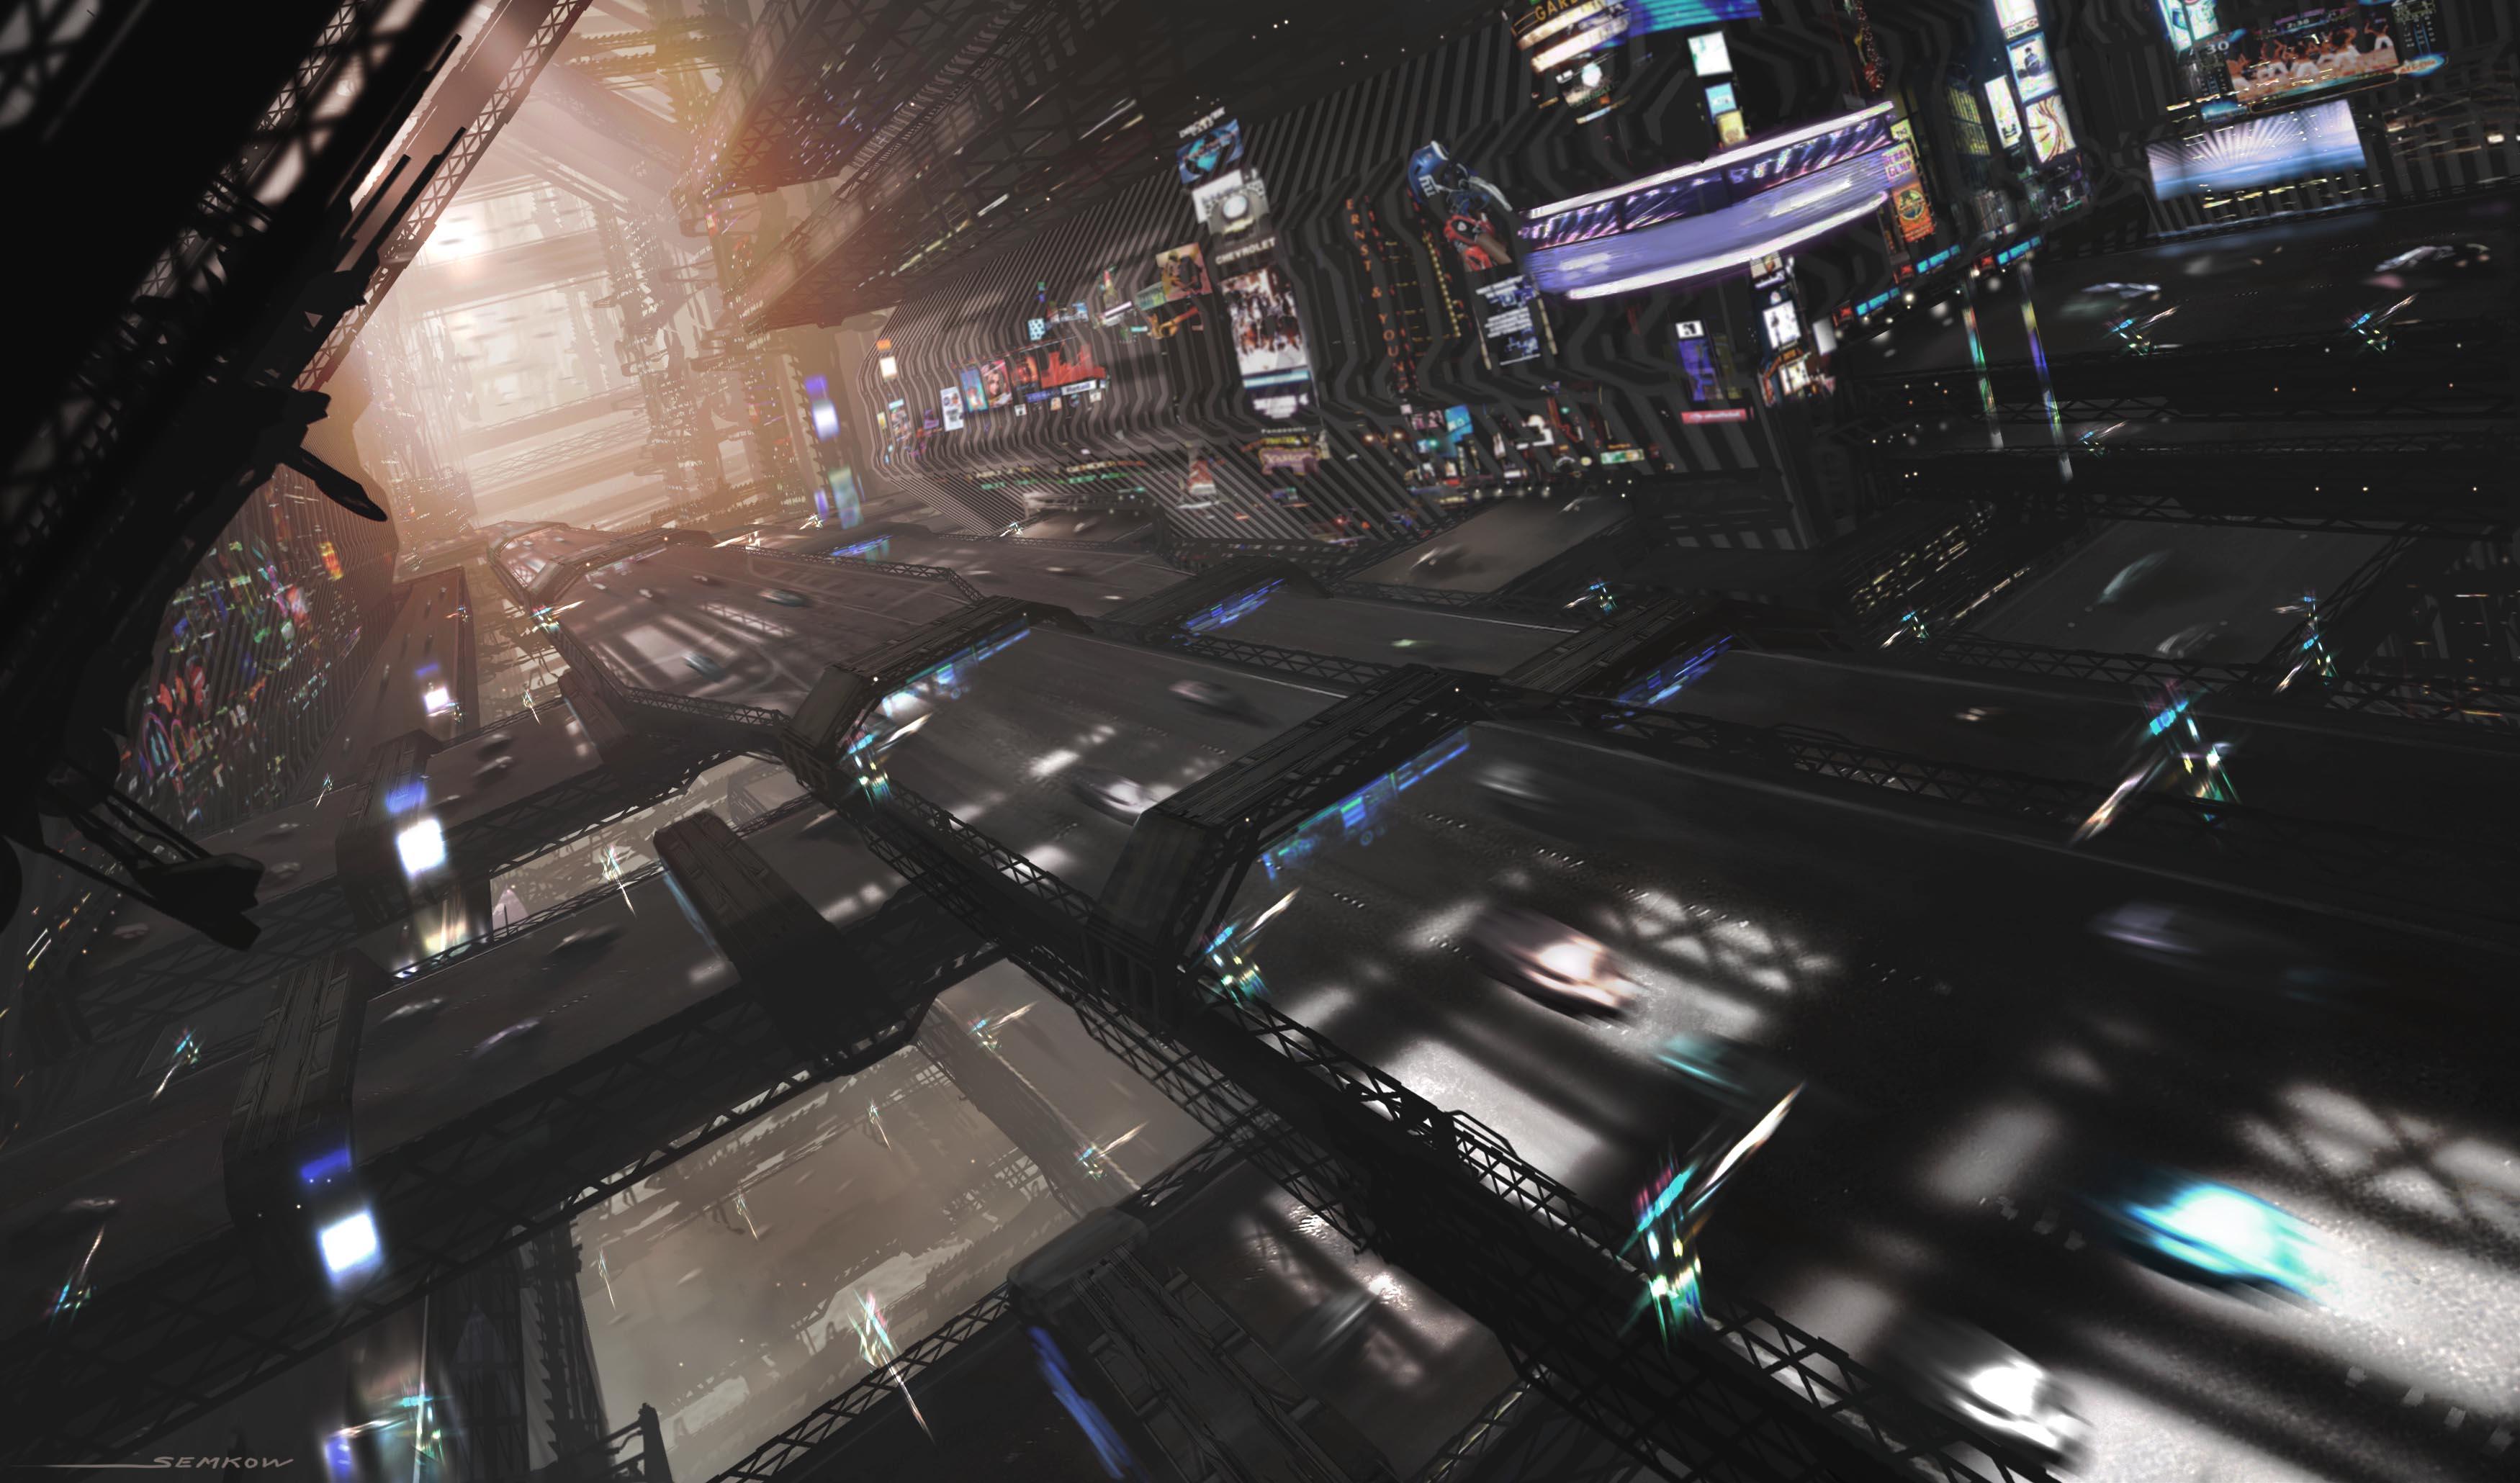 Cyberpunk HD Wallpapers Backgrounds 3500x2060